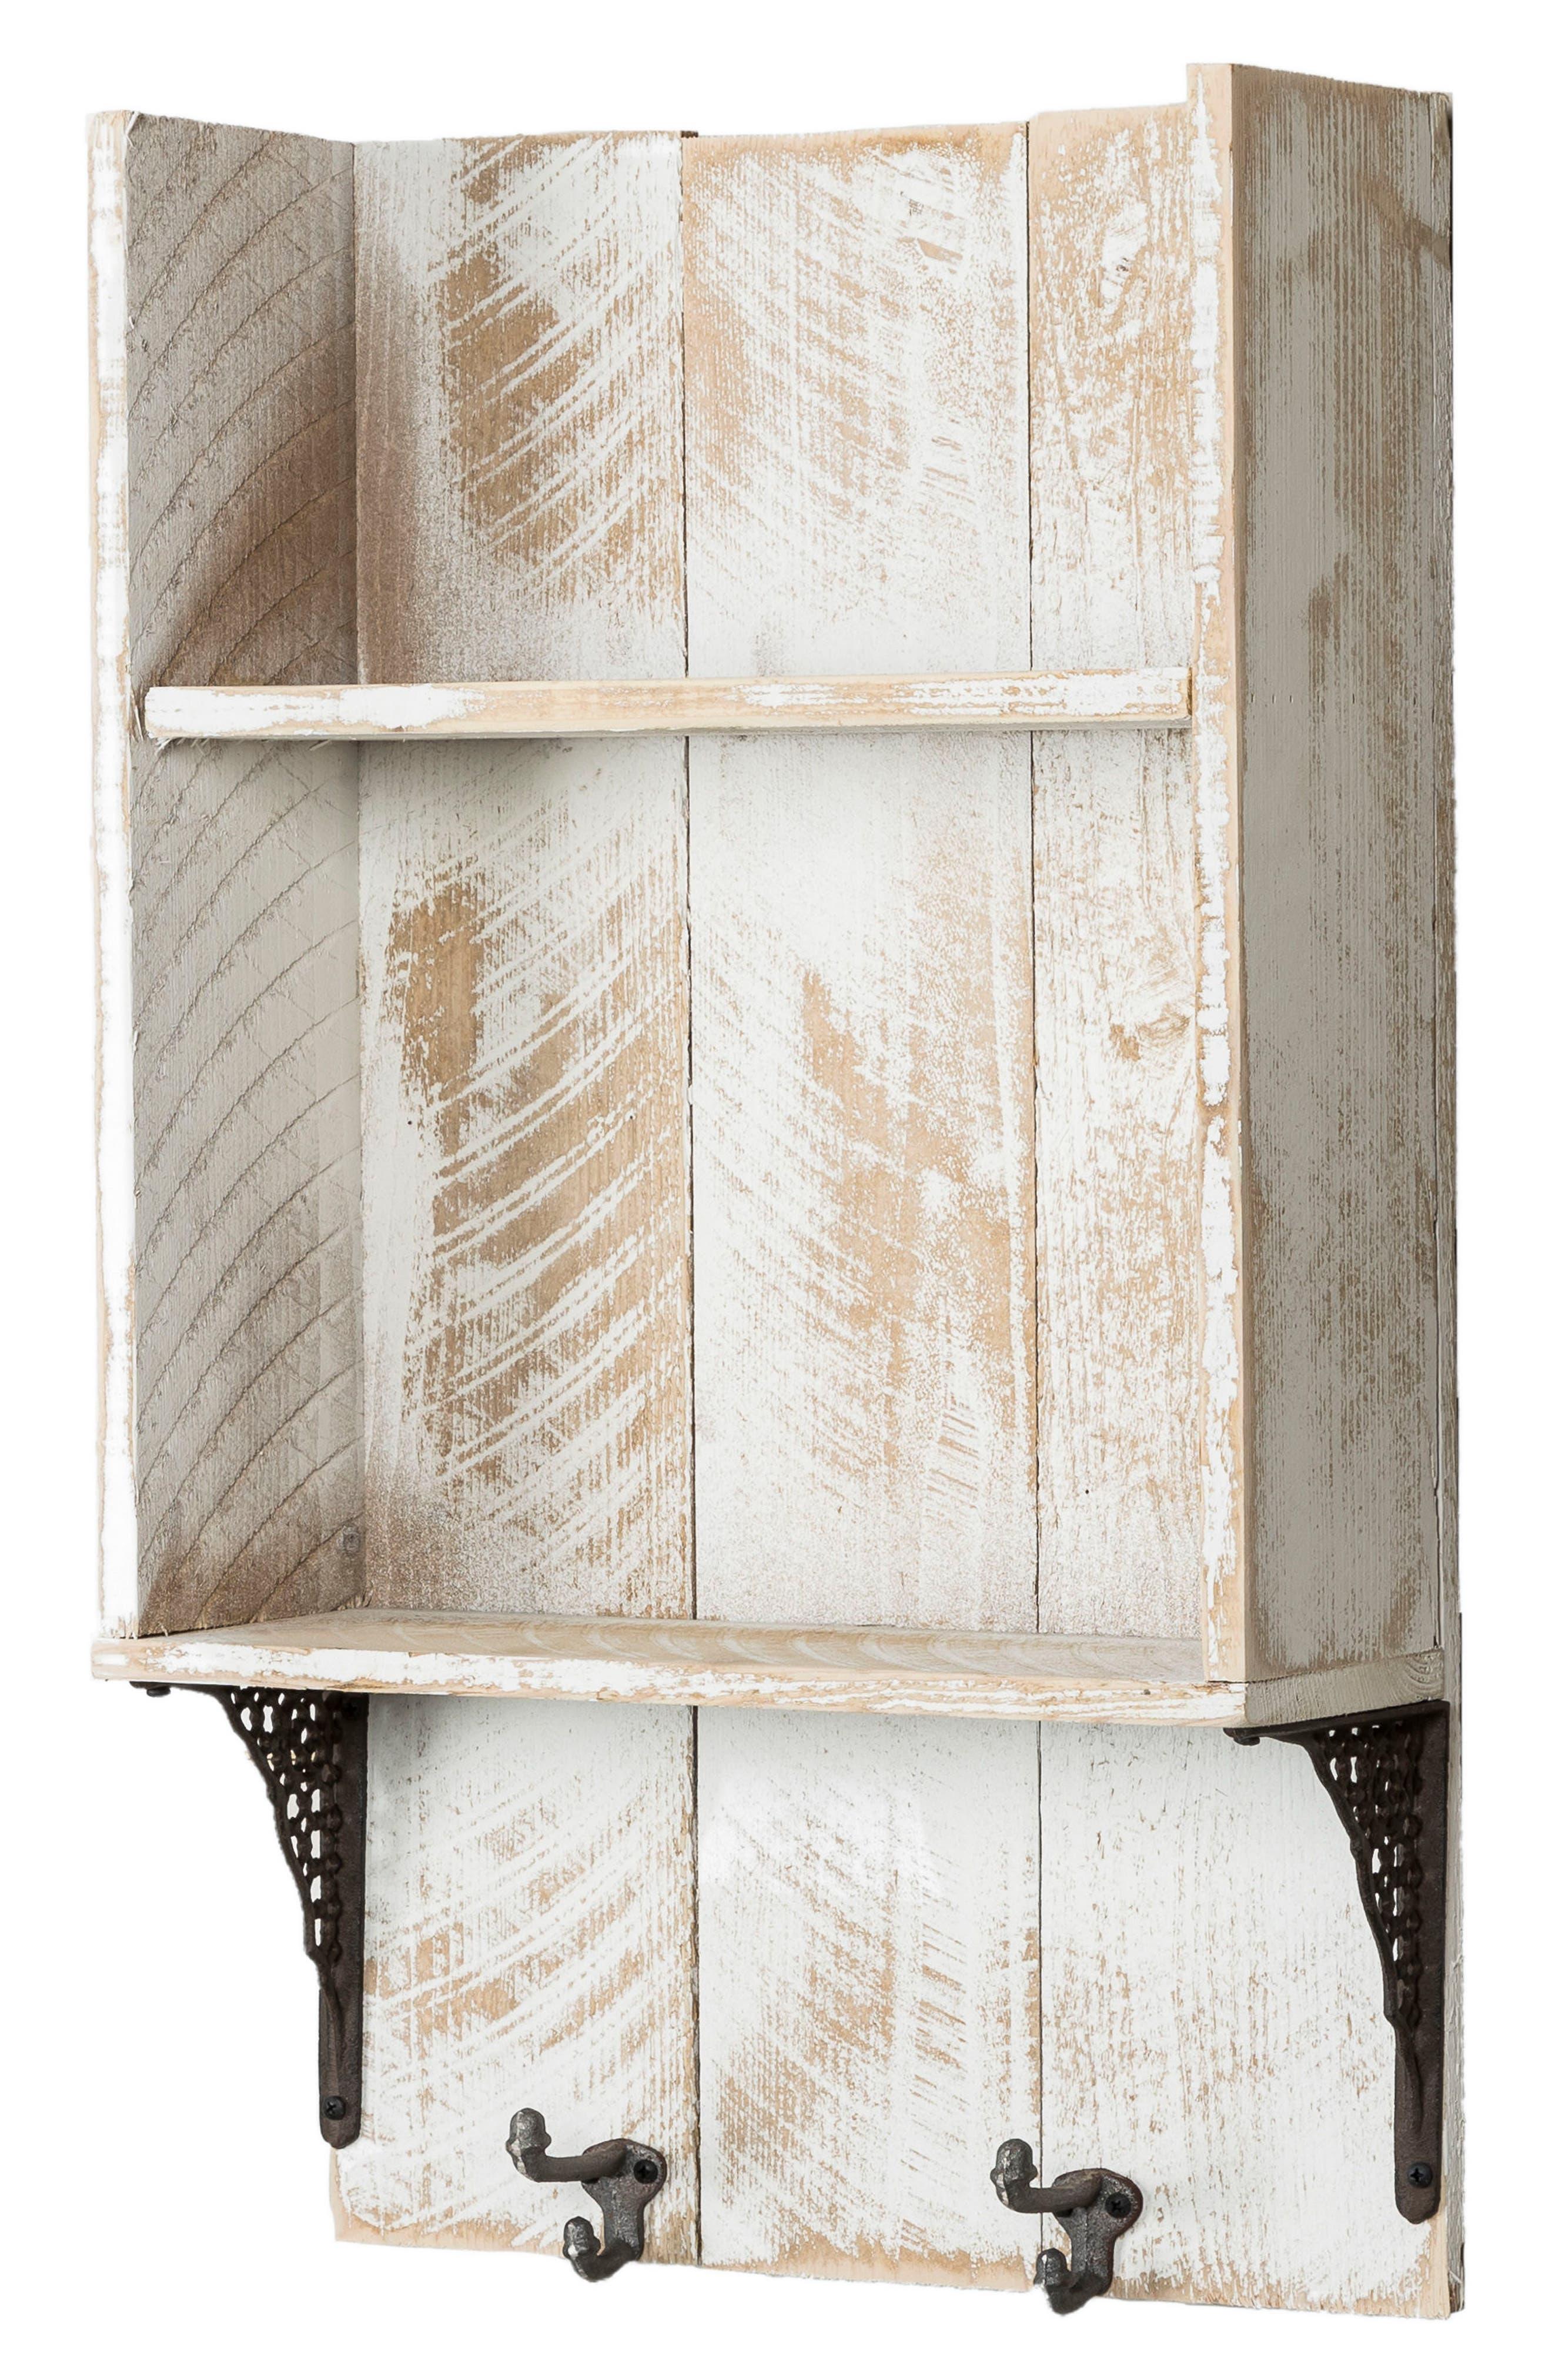 Reclaimed Wood Shelf with Hooks,                             Alternate thumbnail 3, color,                             100